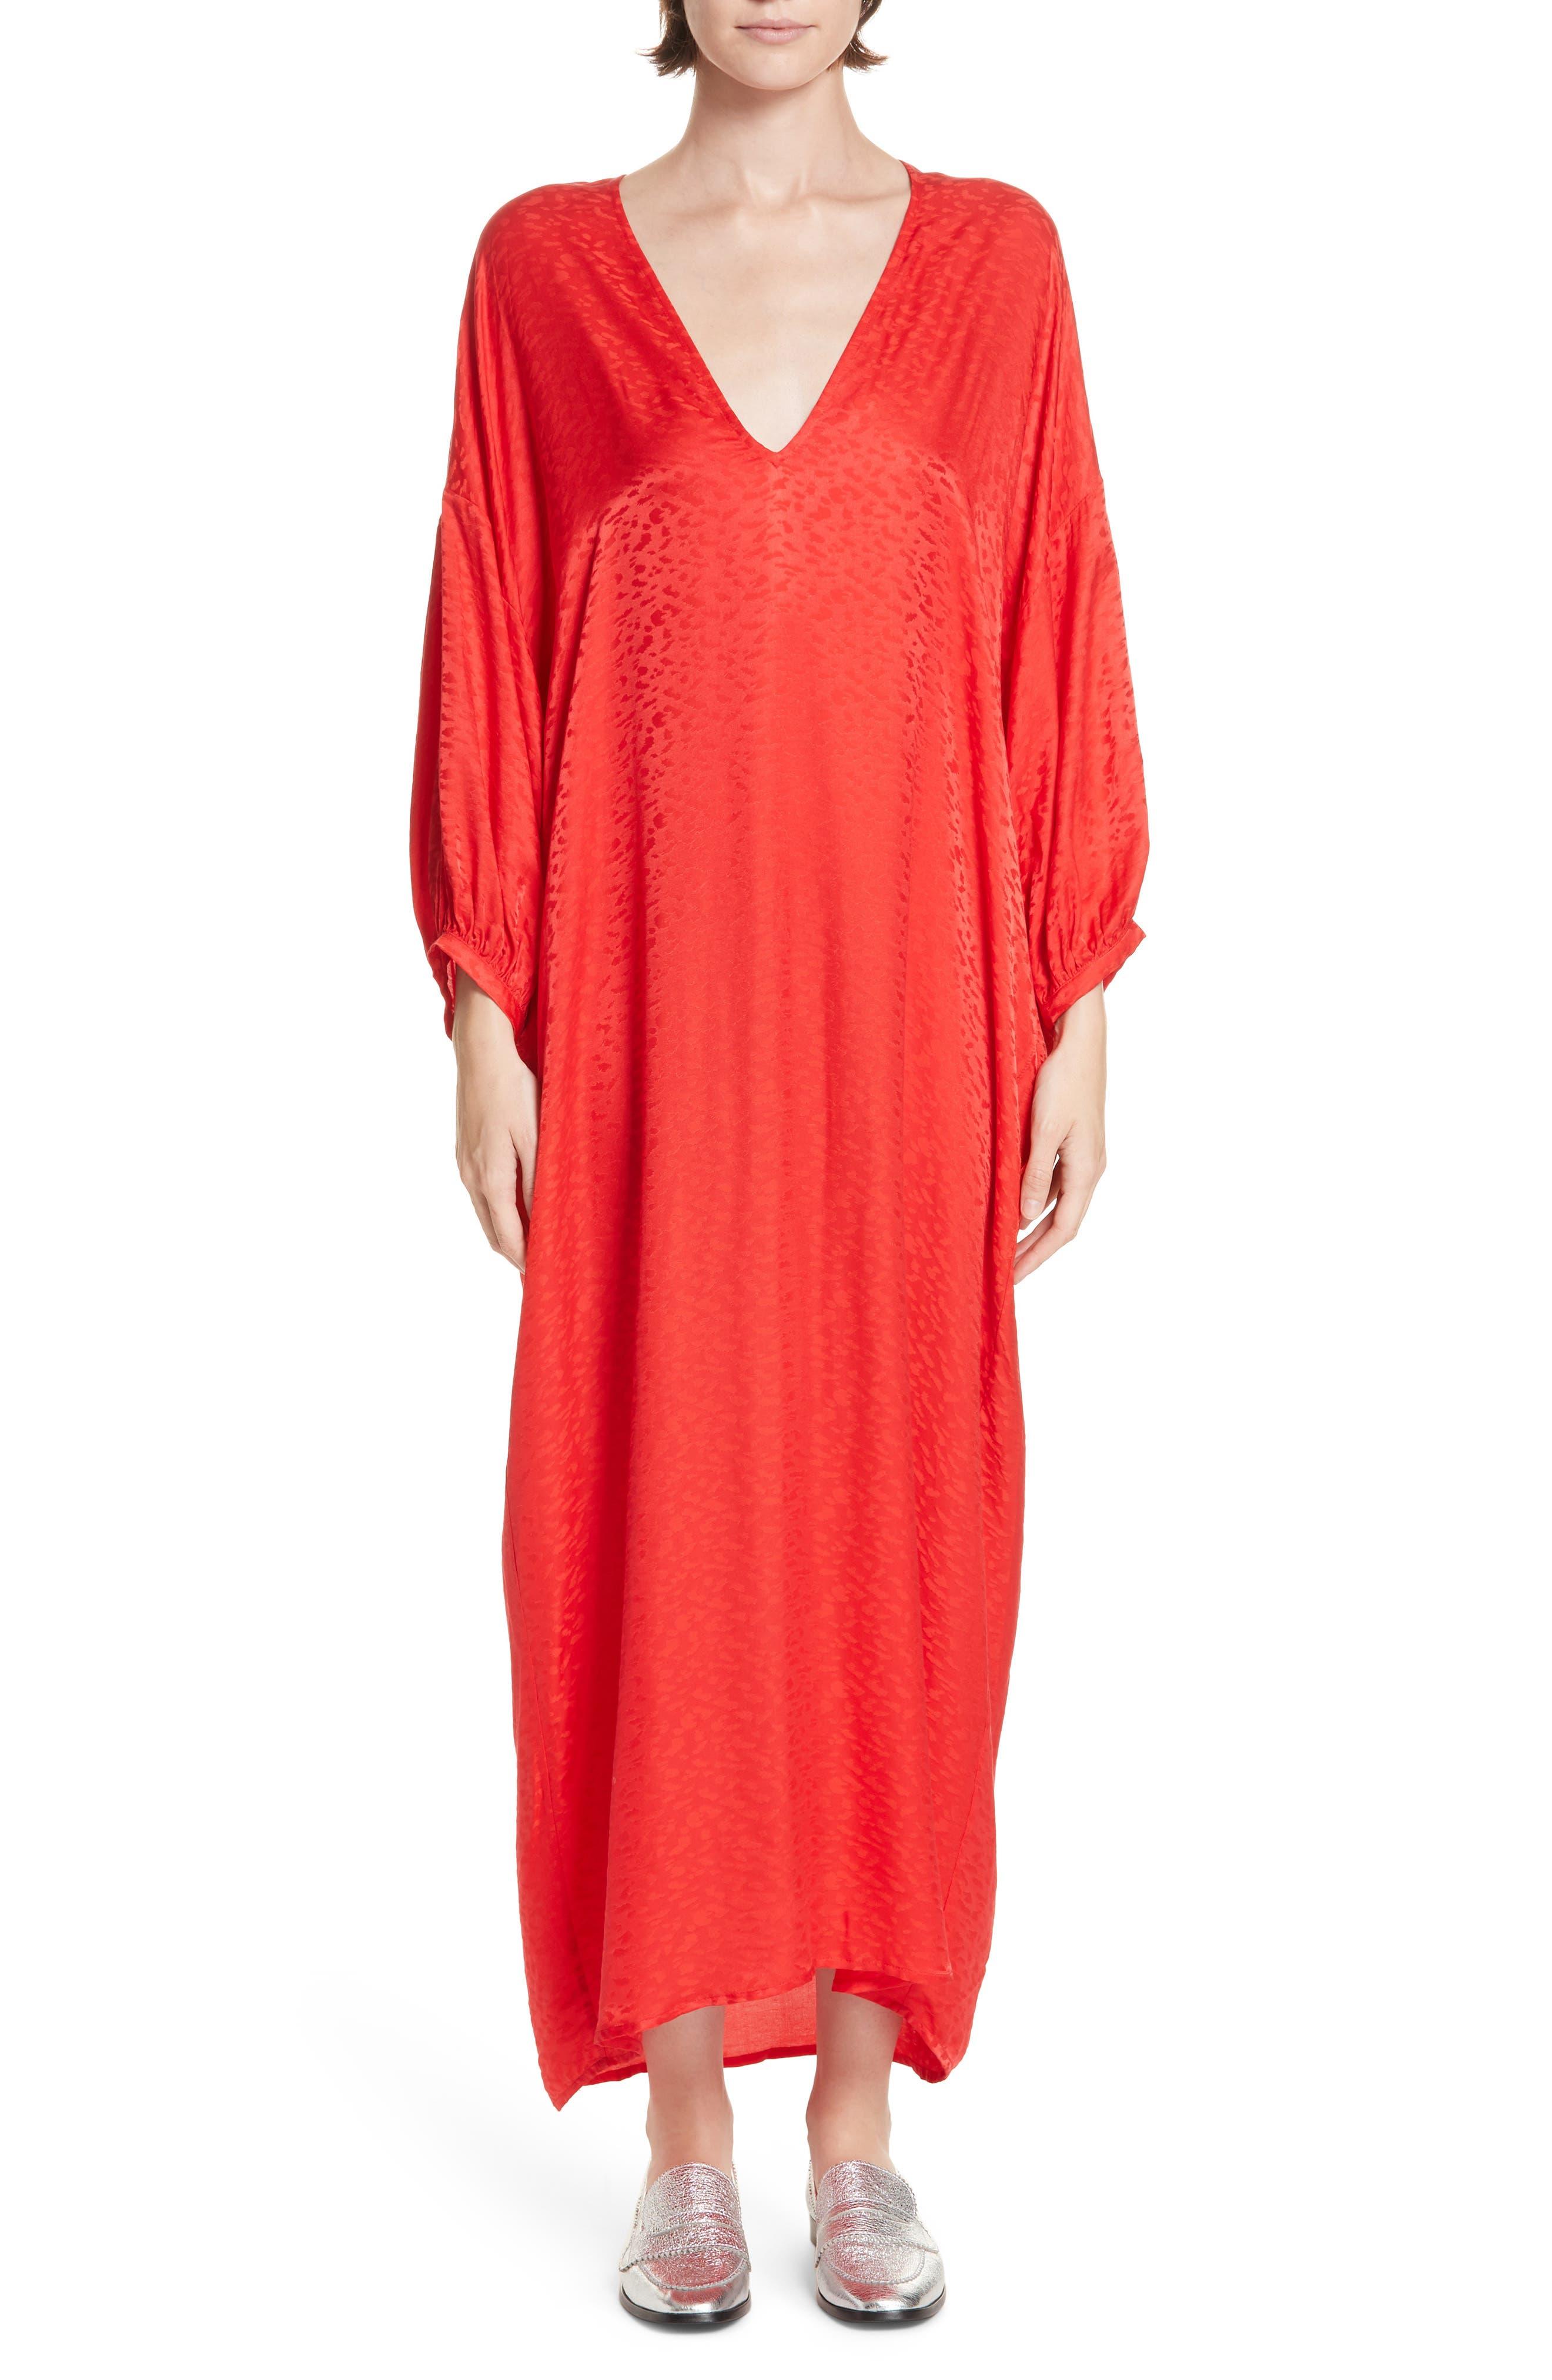 Roseanna Season Jacquard Maxi Dress, US / 40 FR - Red